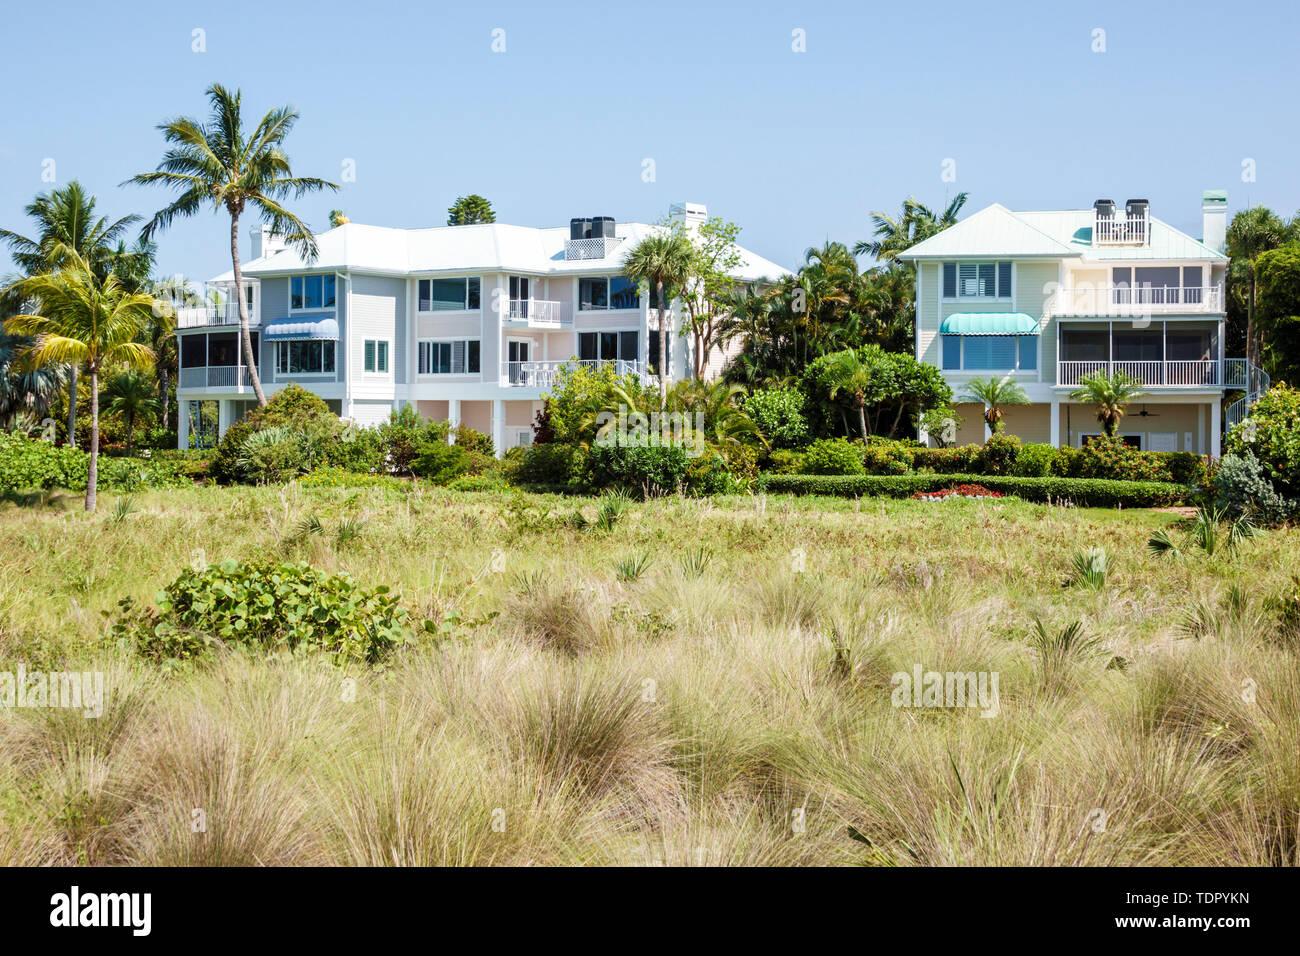 Sanibel Island Florida East Gulf Drive oceanfront beachfront homes large single-family houses multi-story dune grasses - Stock Image